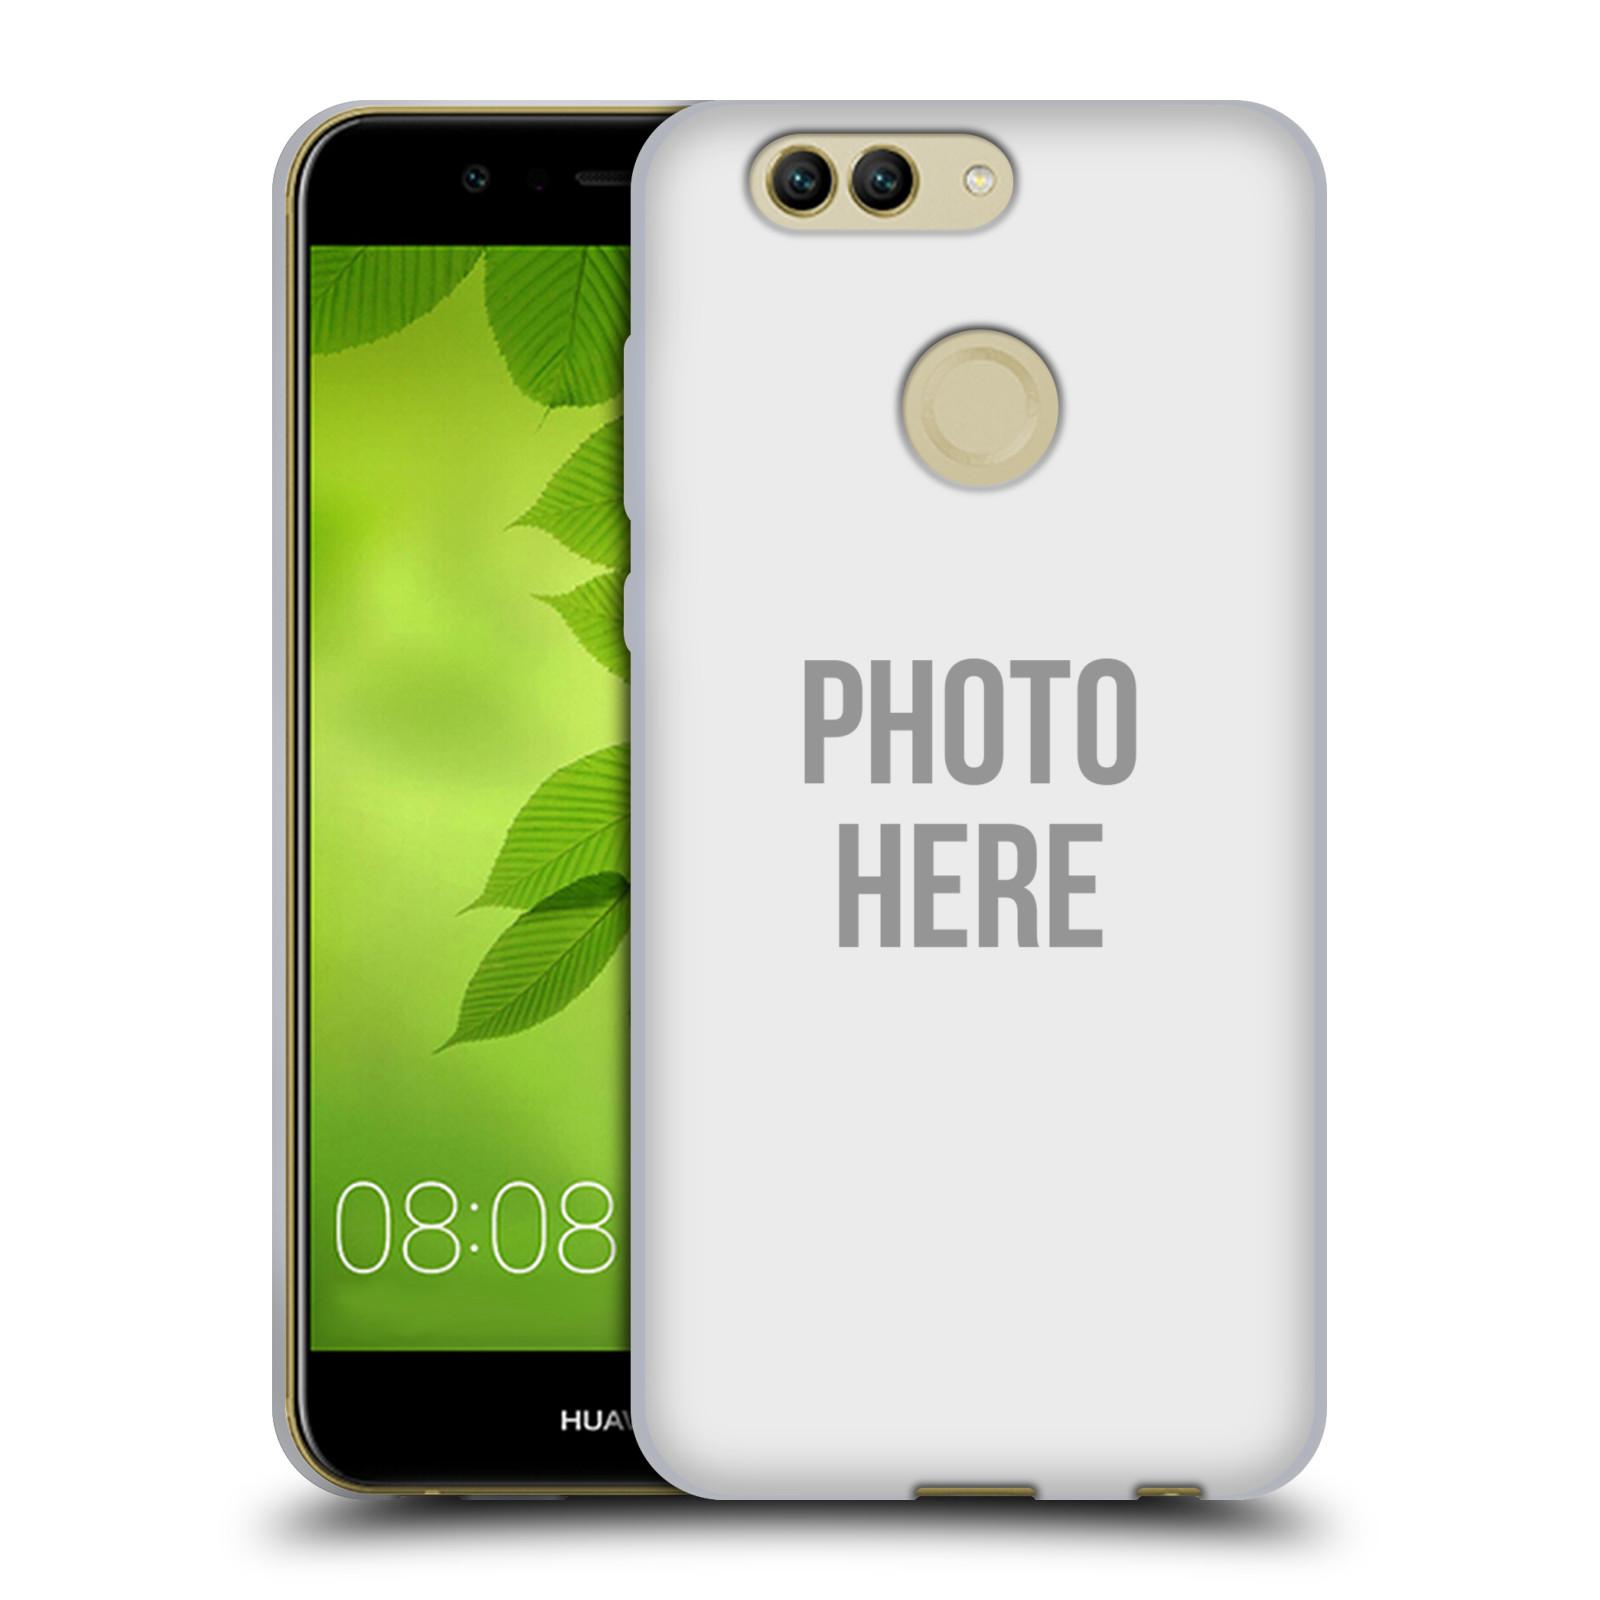 Silikonové pouzdro na mobil Huawei Nova 2 Plus - Head Case - s vlastním motivem (Silikonový kryt či obal na mobilní telefon Huawei Nova 2 Plus s vlastním motivem)